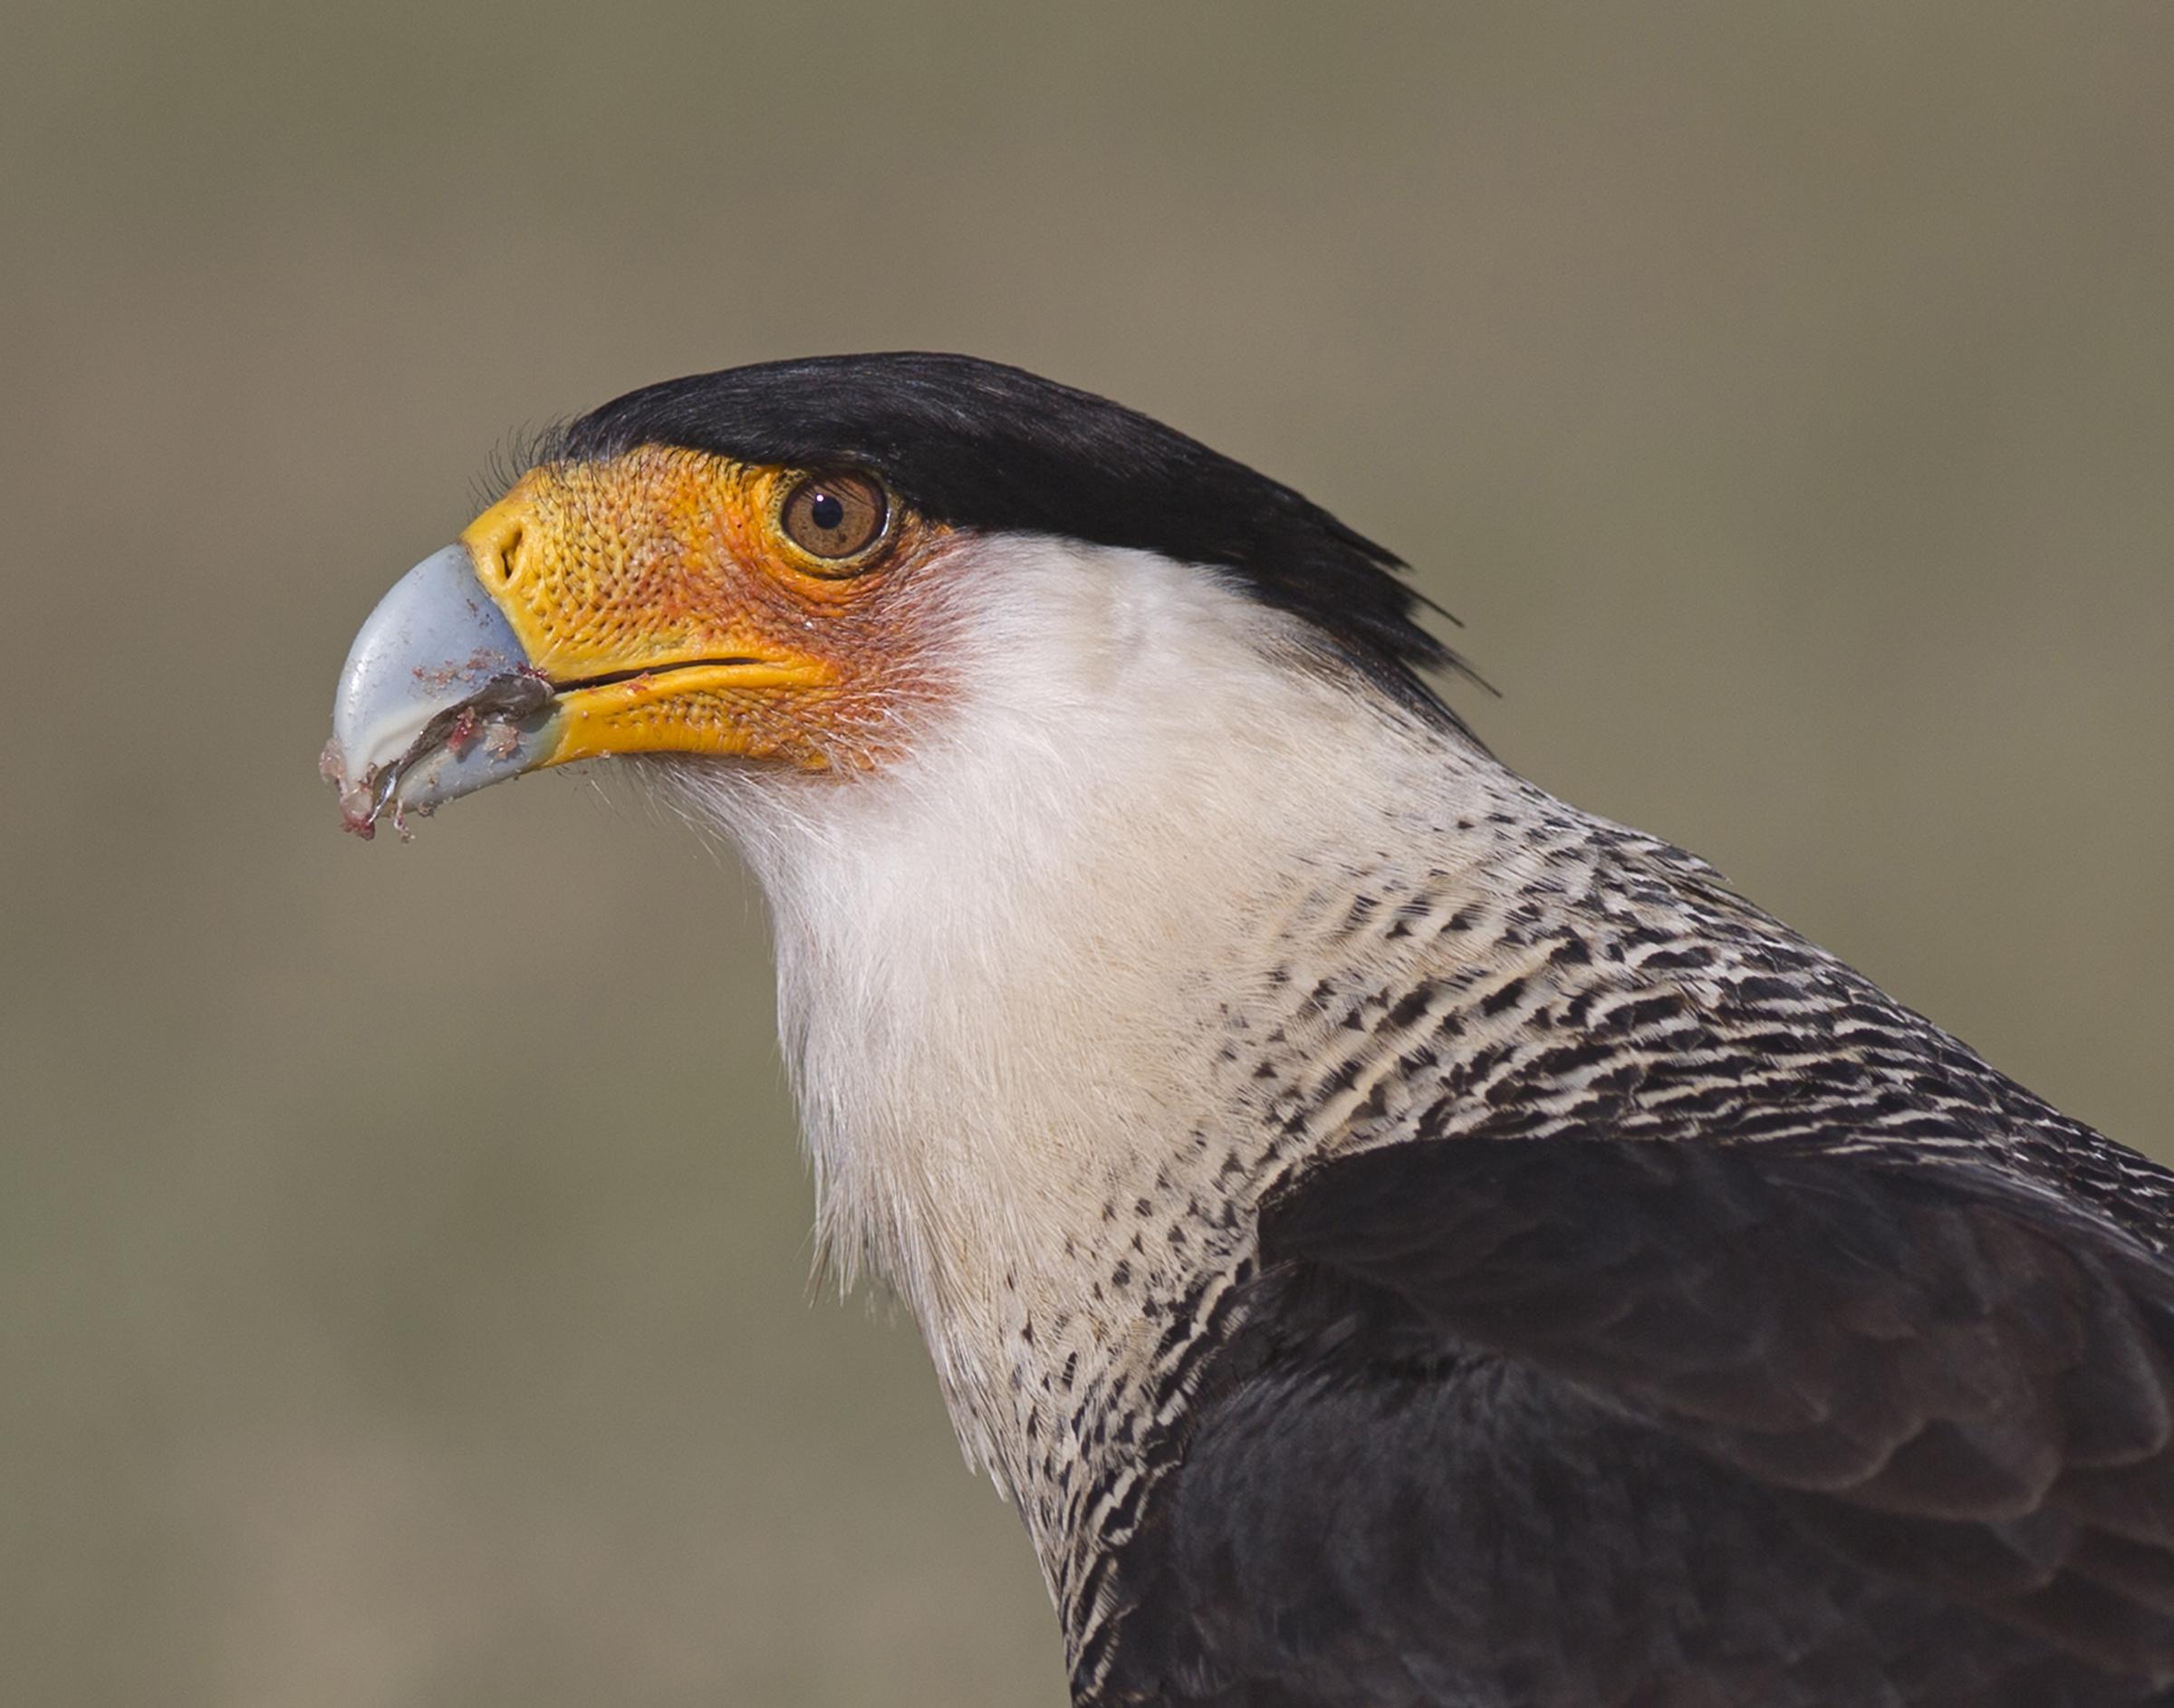 Crested Caracara. Photo: Rob Sabatini/Audubon Photography Awards.